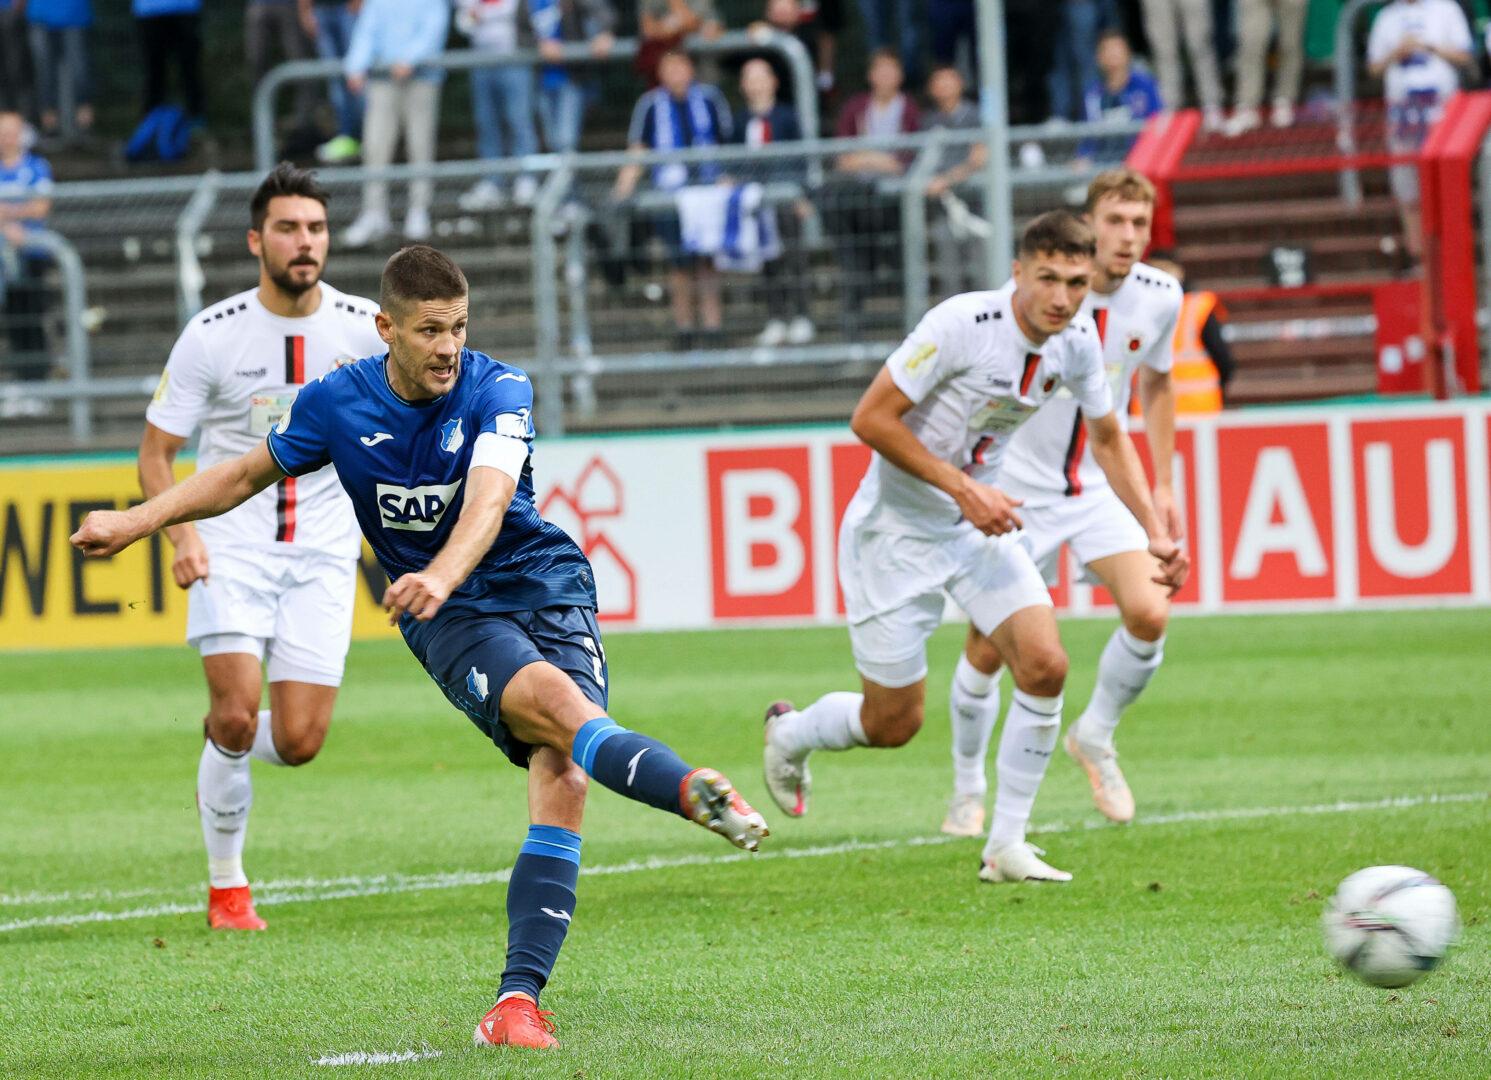 DFB-Pokal: KSC souverän, FCI siegt knapp, Hoffenheim gewinnt im Nachsitzen